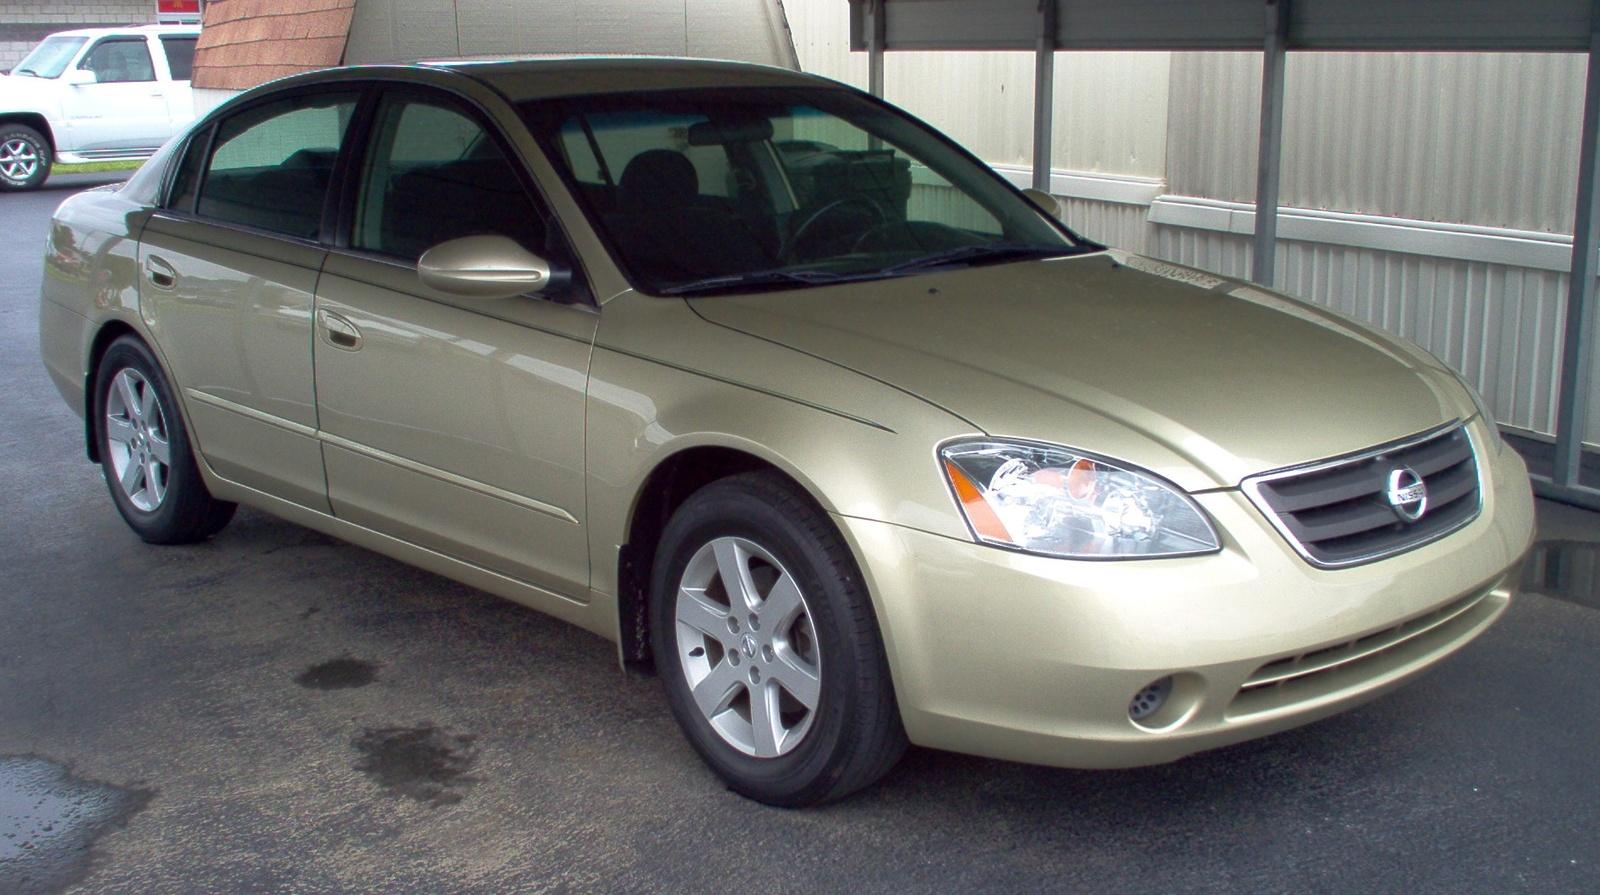 2003 Nissan Altima #15 Nissan Altima #15